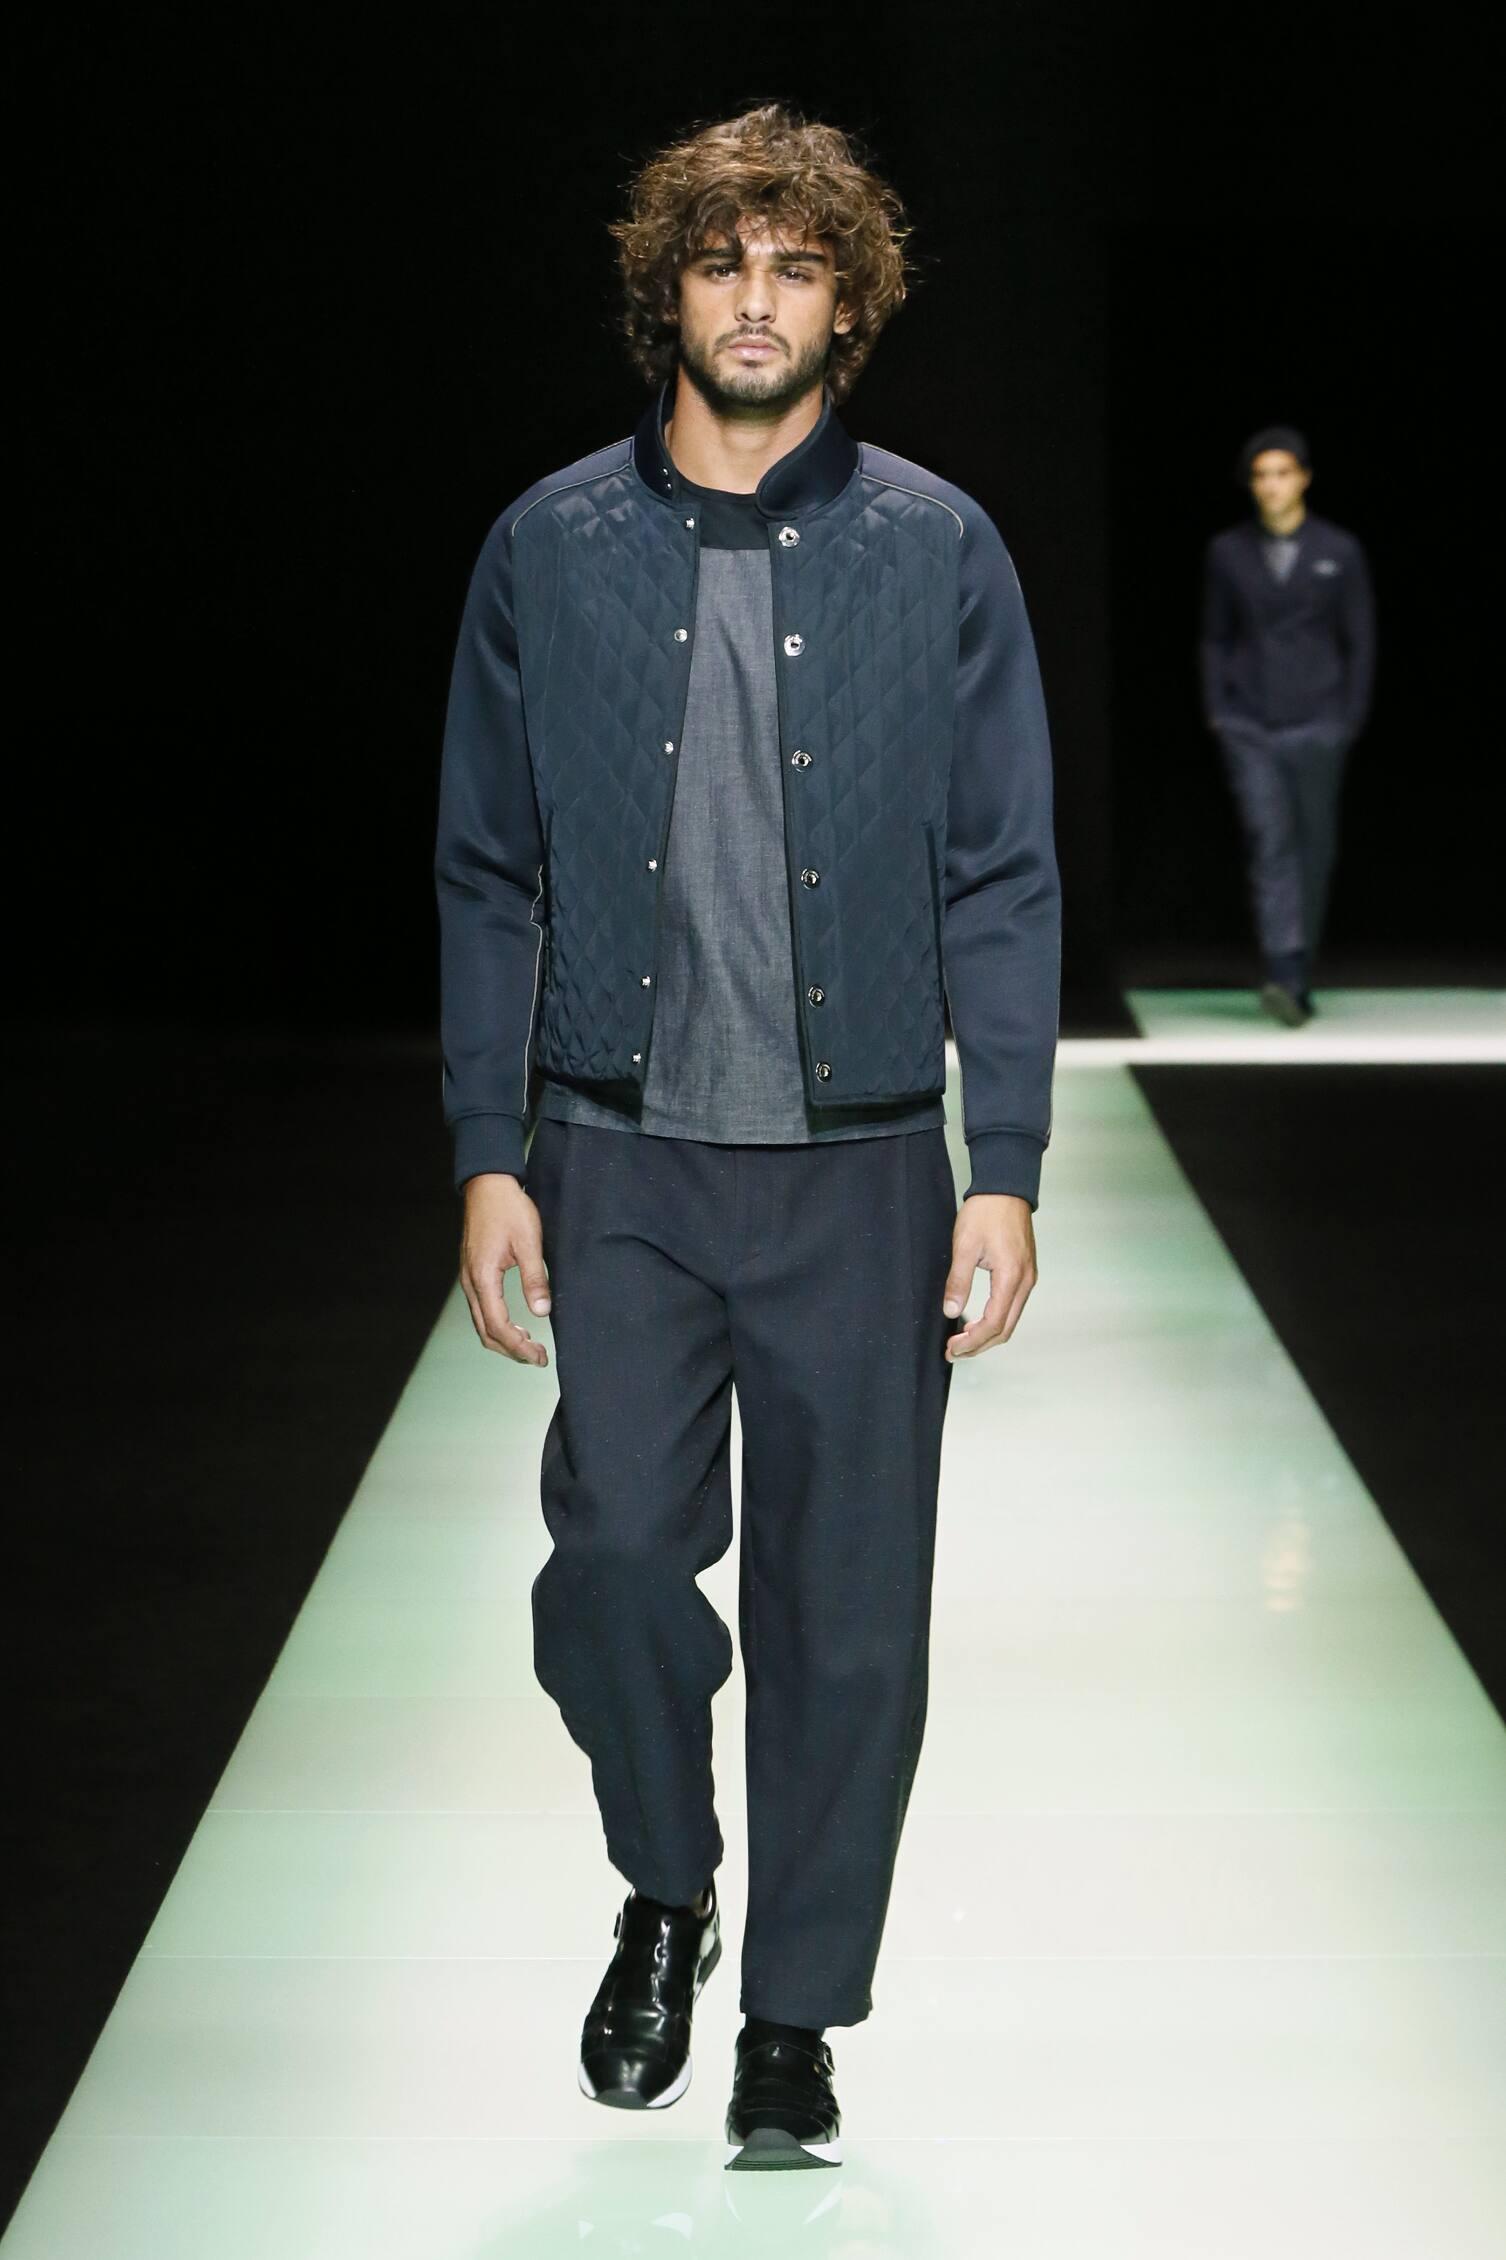 731d2f3c9b1 Runway Emporio Armani Spring Summer 2016 Men s Collection Milan Fashion Week